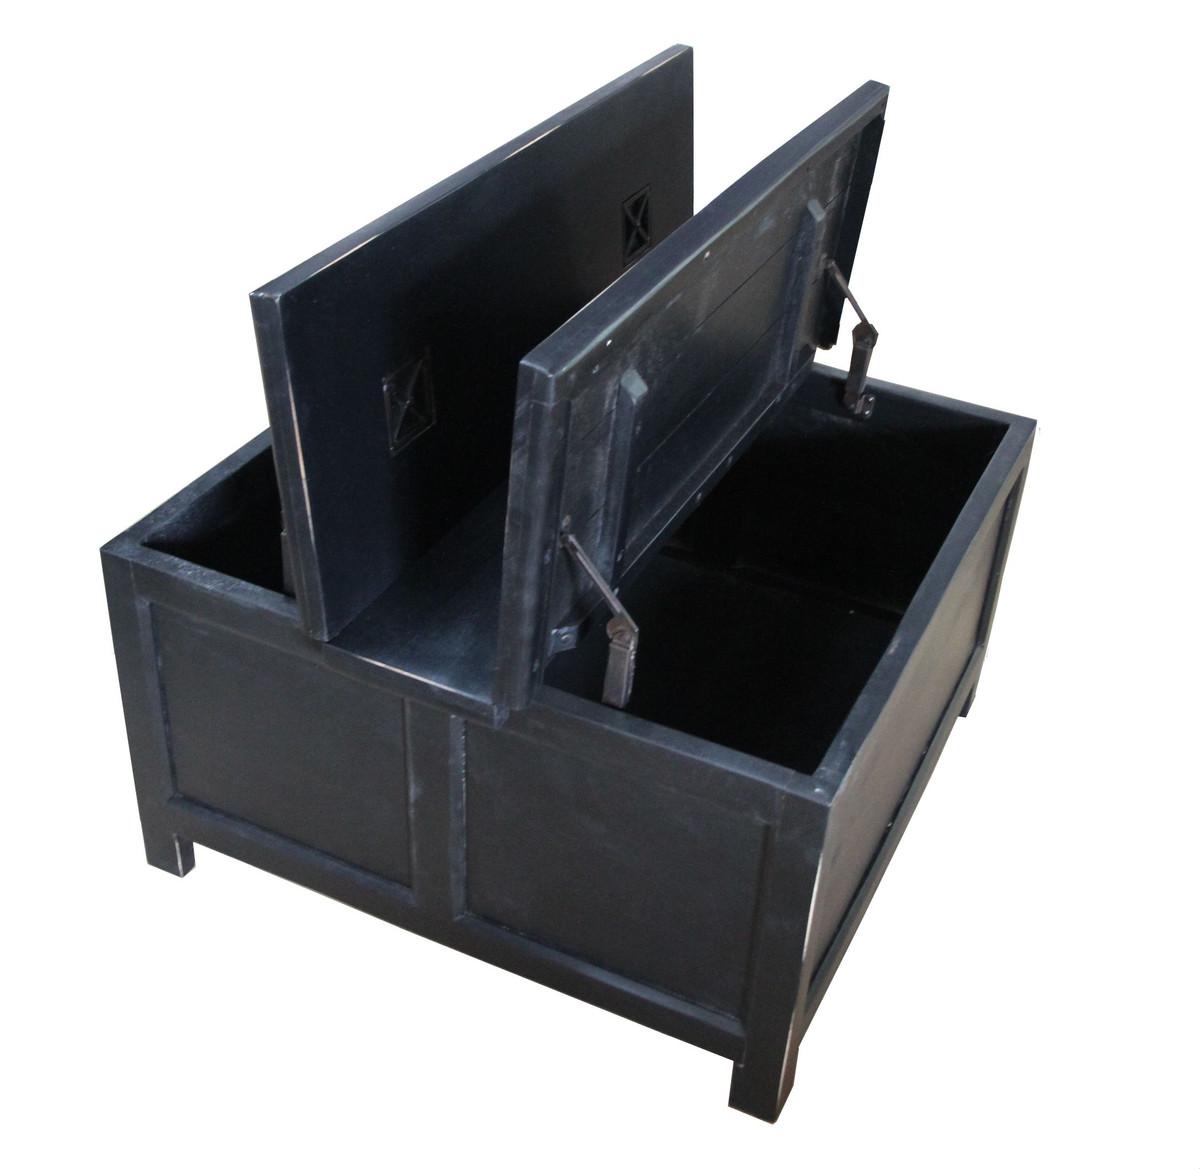 Casa padrino folding table in black 85 5 cm x 85 5 cm x for Table 85 cm de large